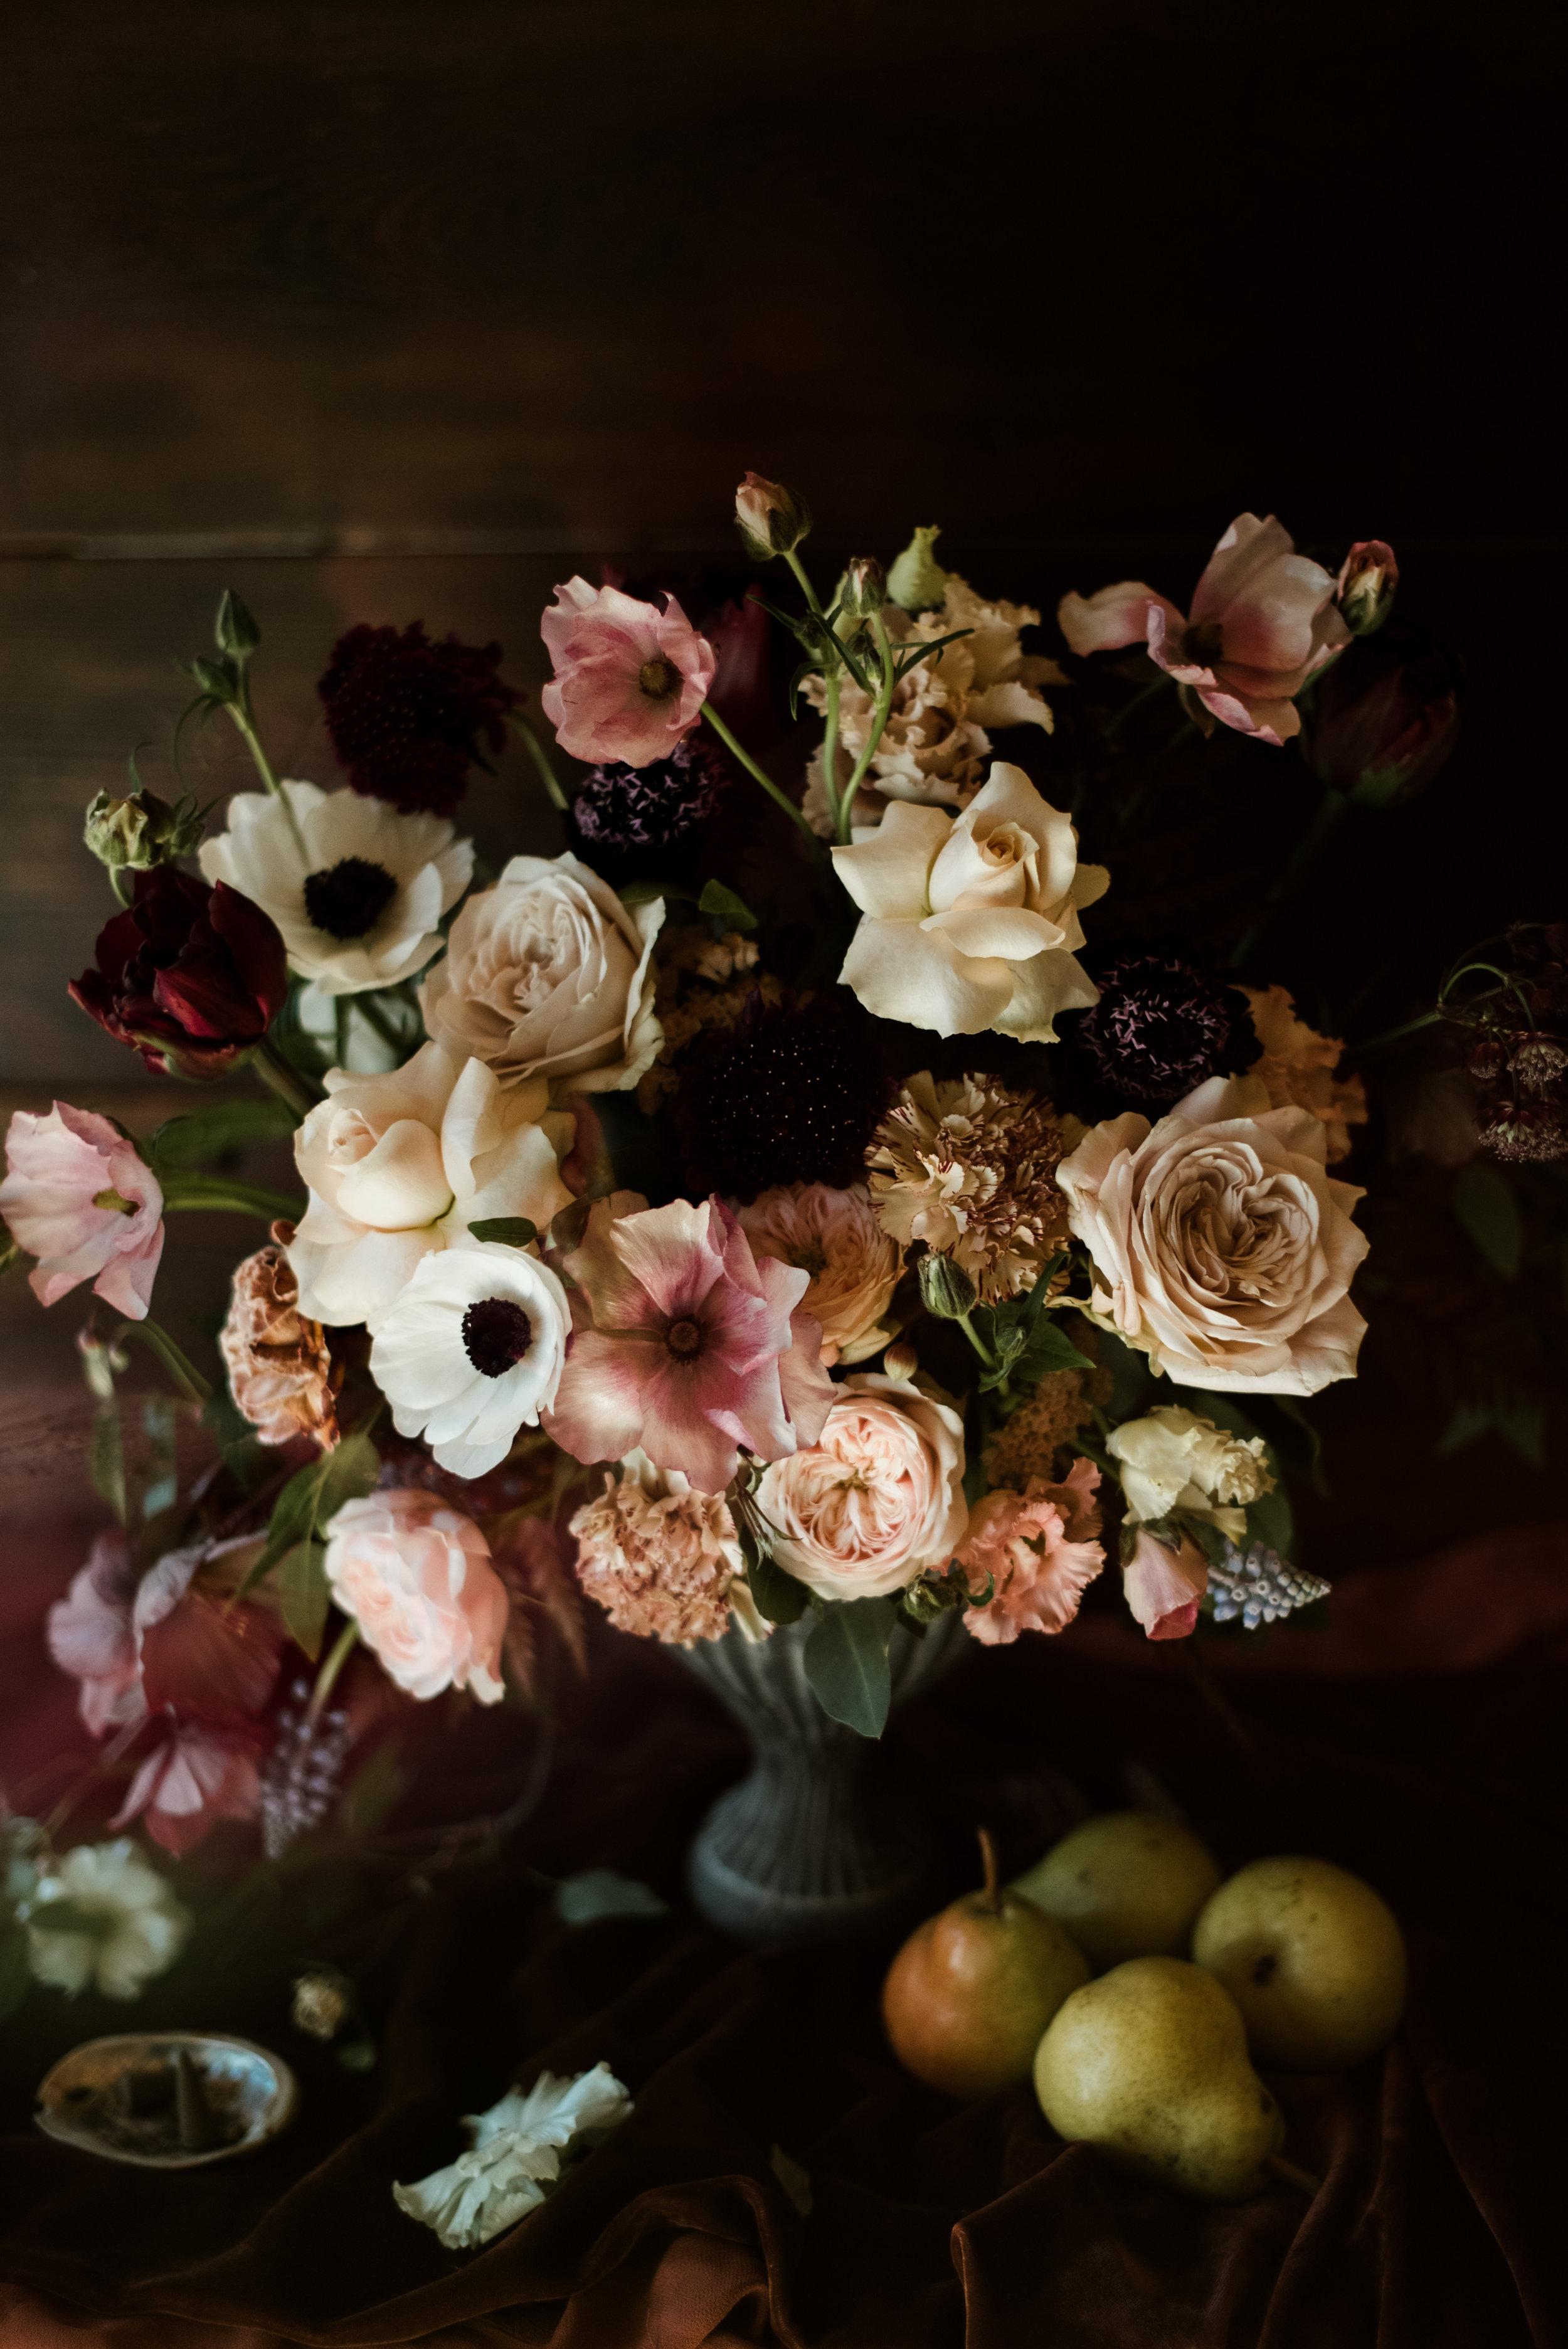 DarkRomance-GHphoto-18.jpg